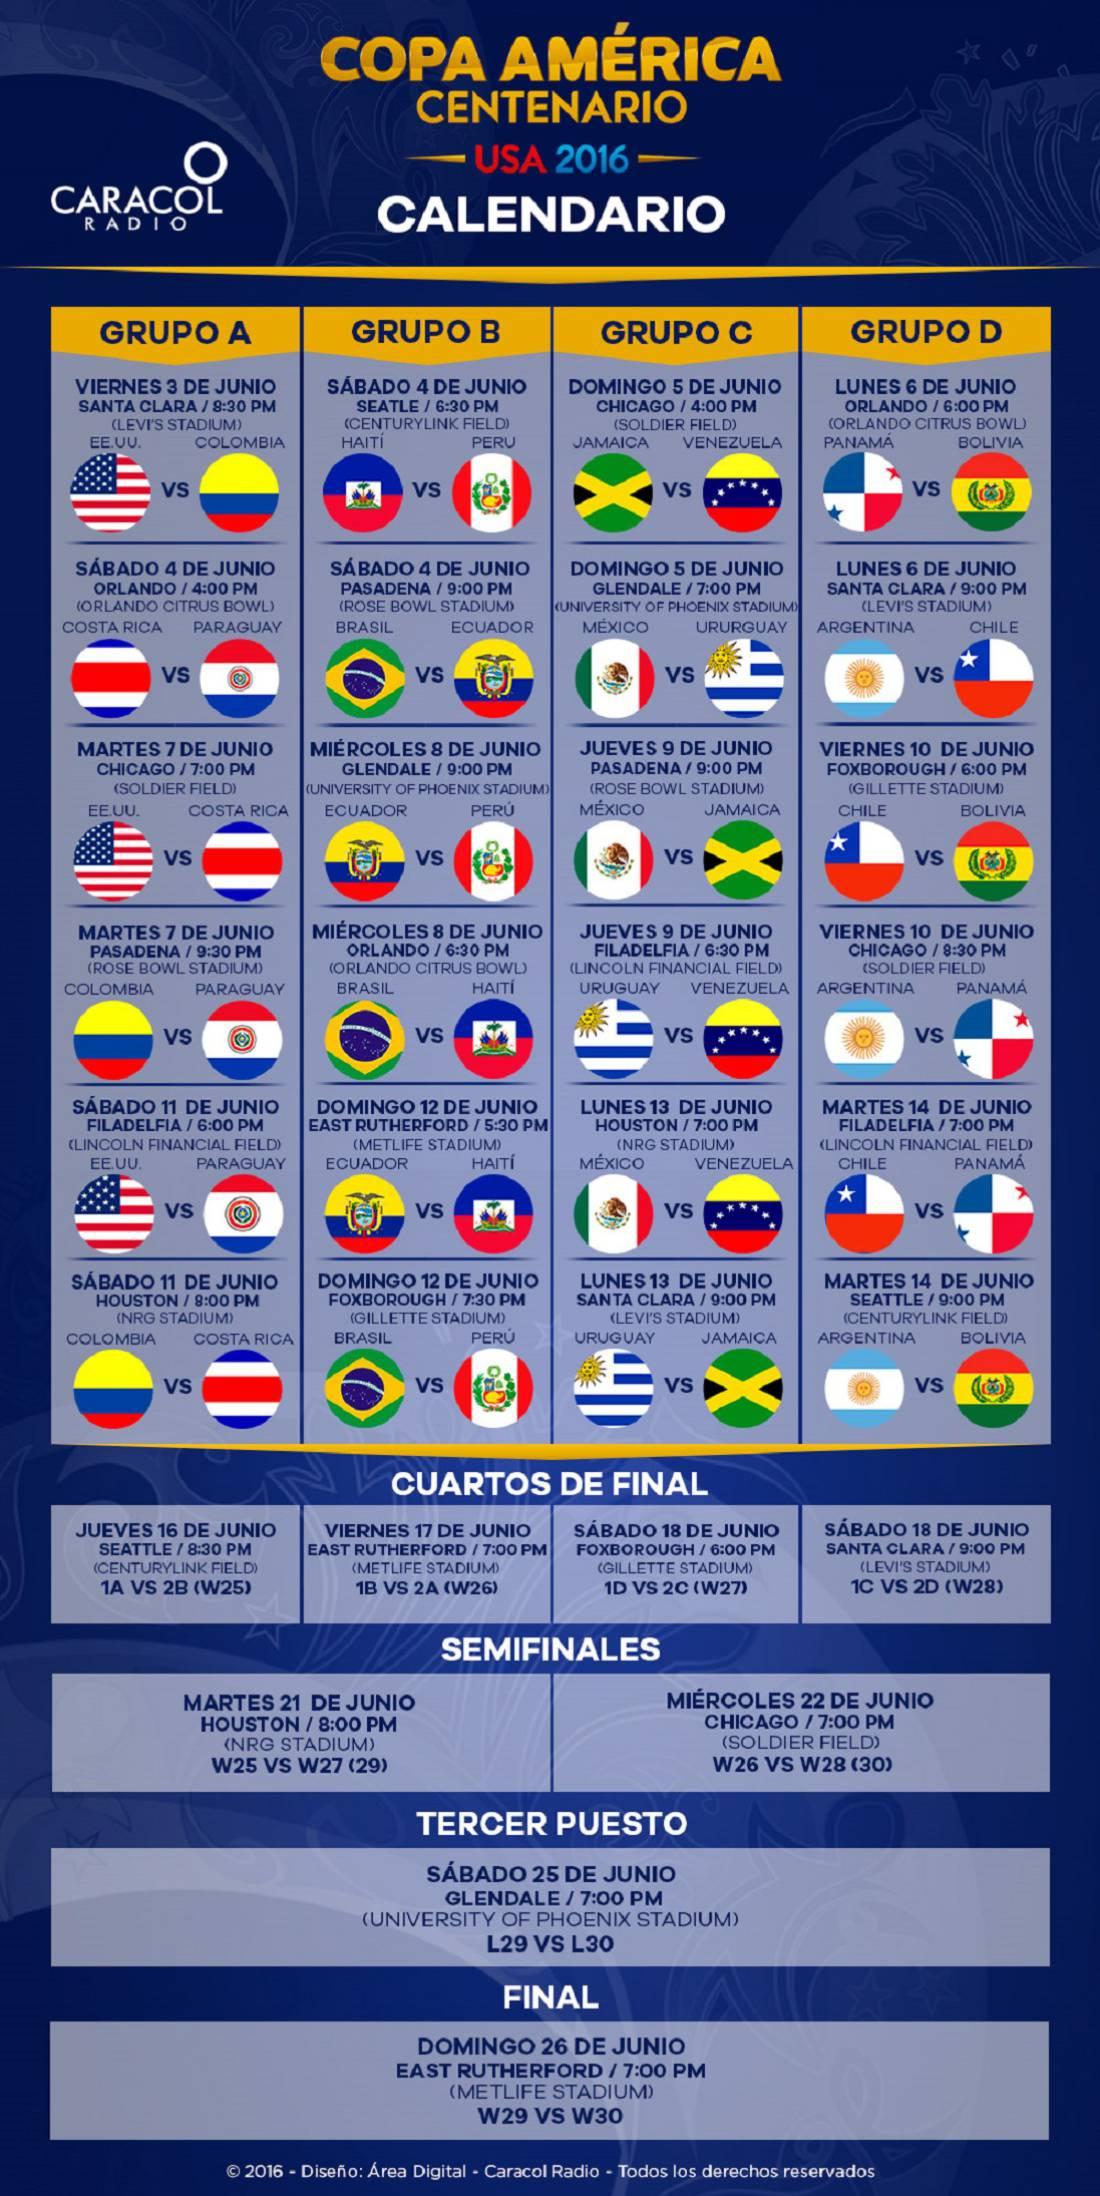 Calendario de la Copa América Centenario: [Infografía] Calendario de la Copa América Centenario